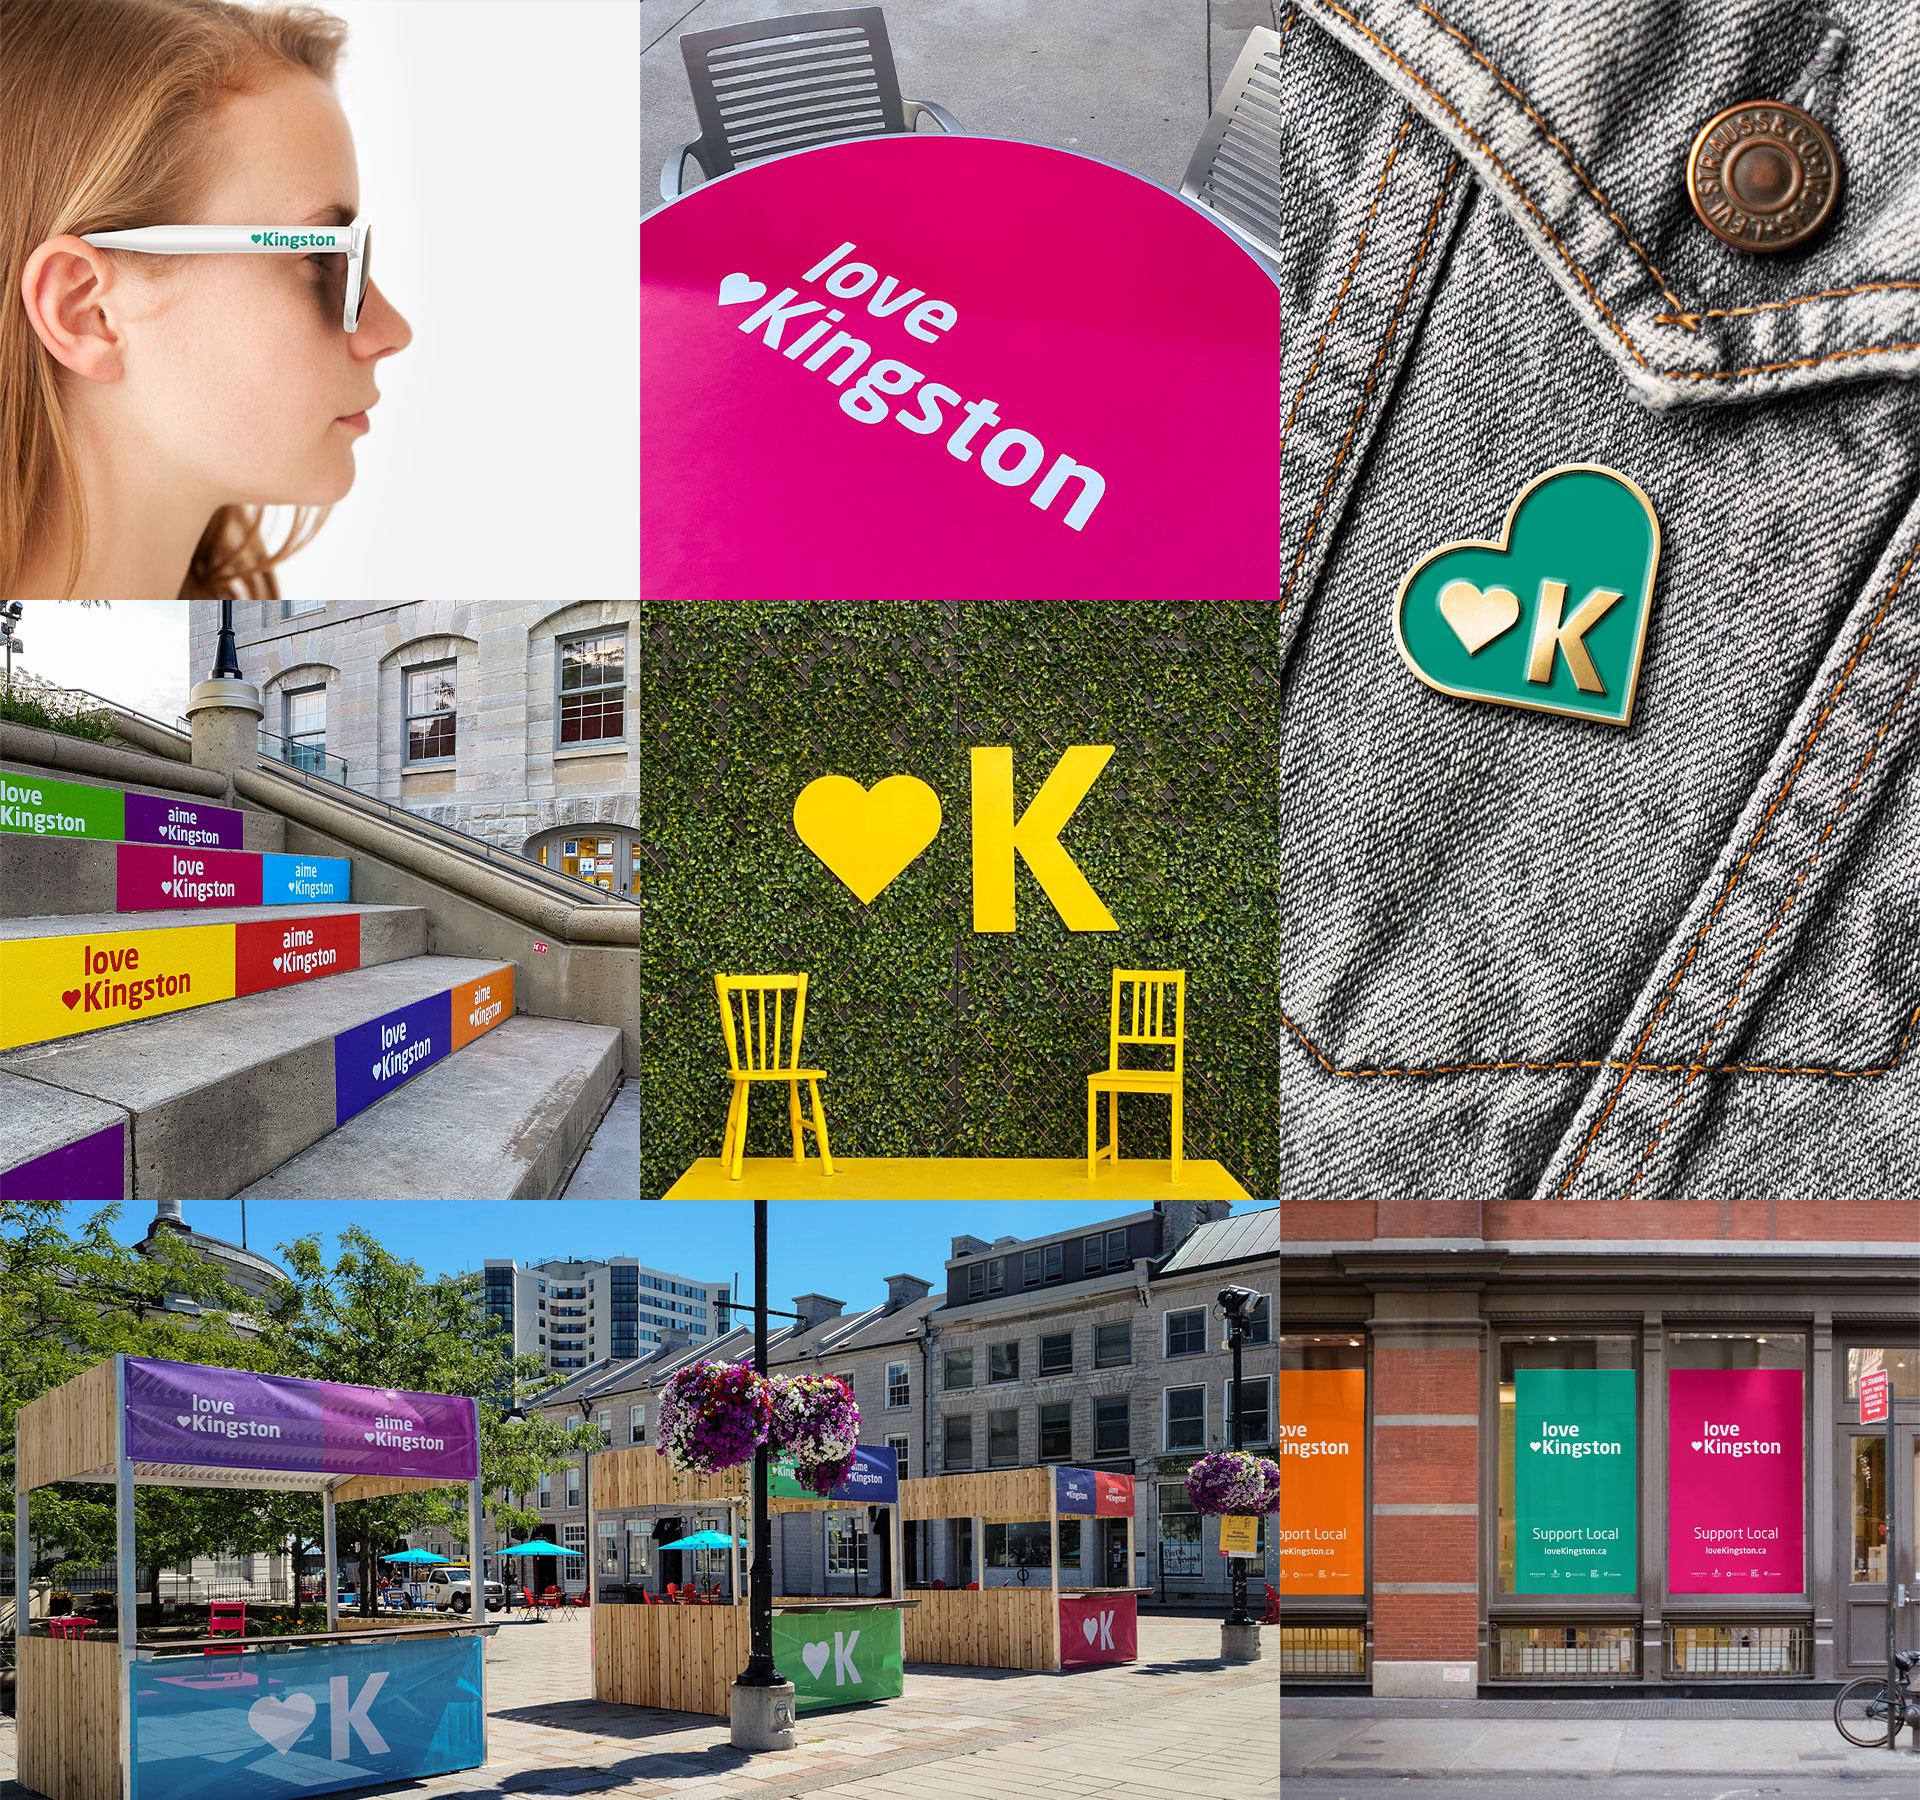 love-kingston-application-images